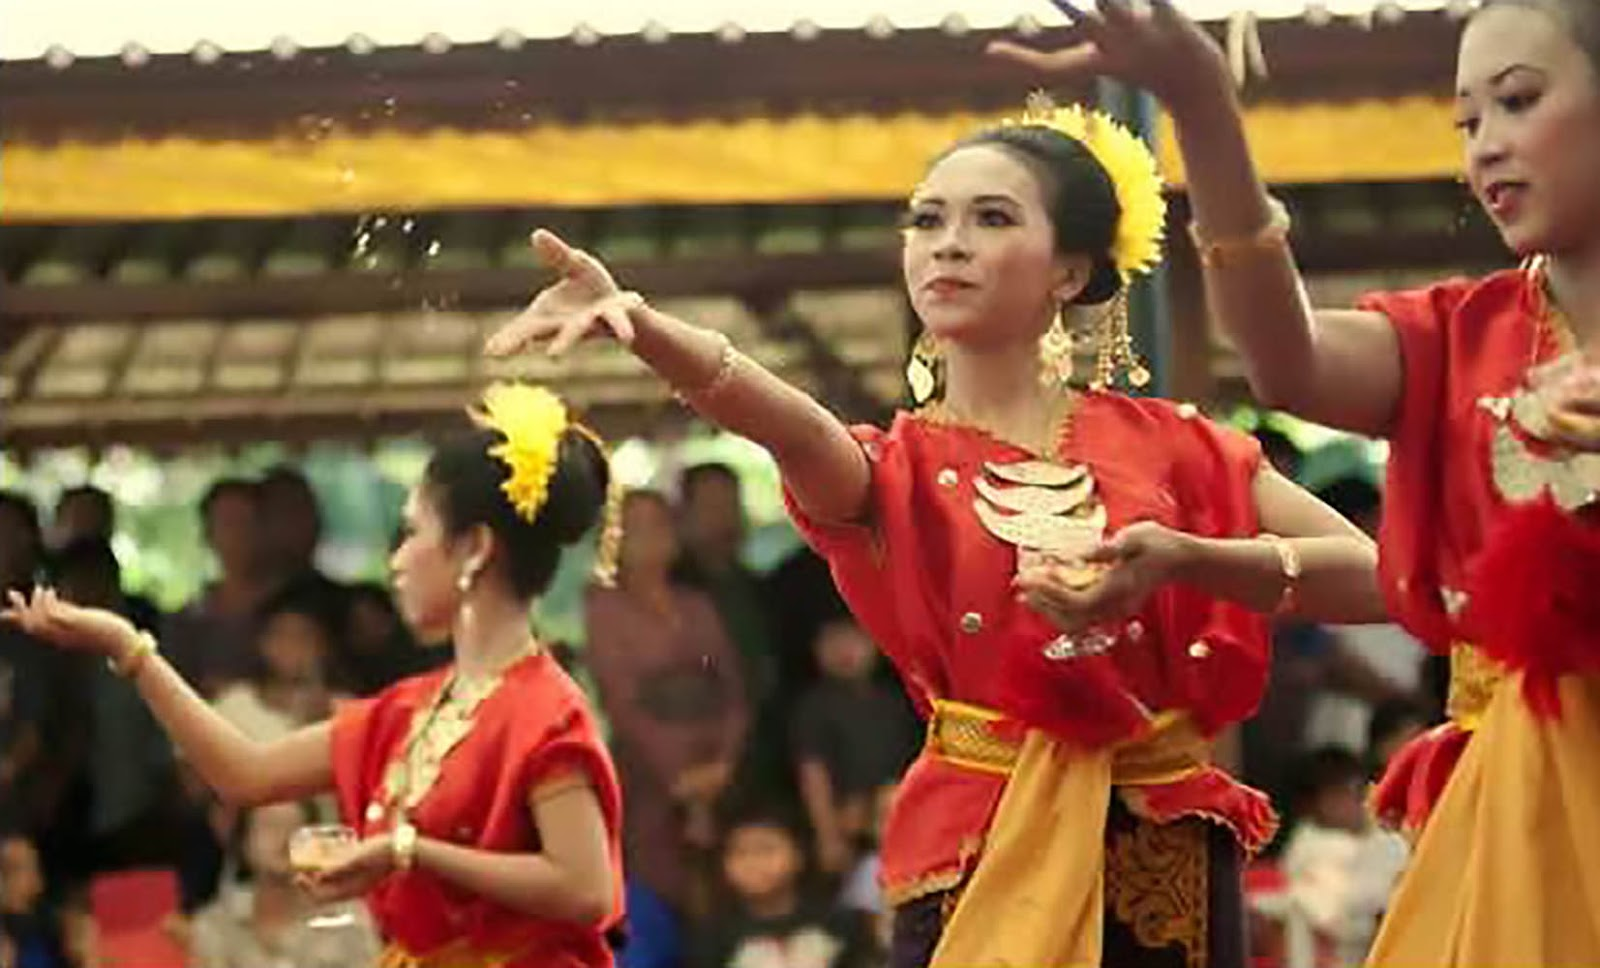 Tari Wura Bongi Monca, Tarian Tradisional Dari Bima Provinsi NTB